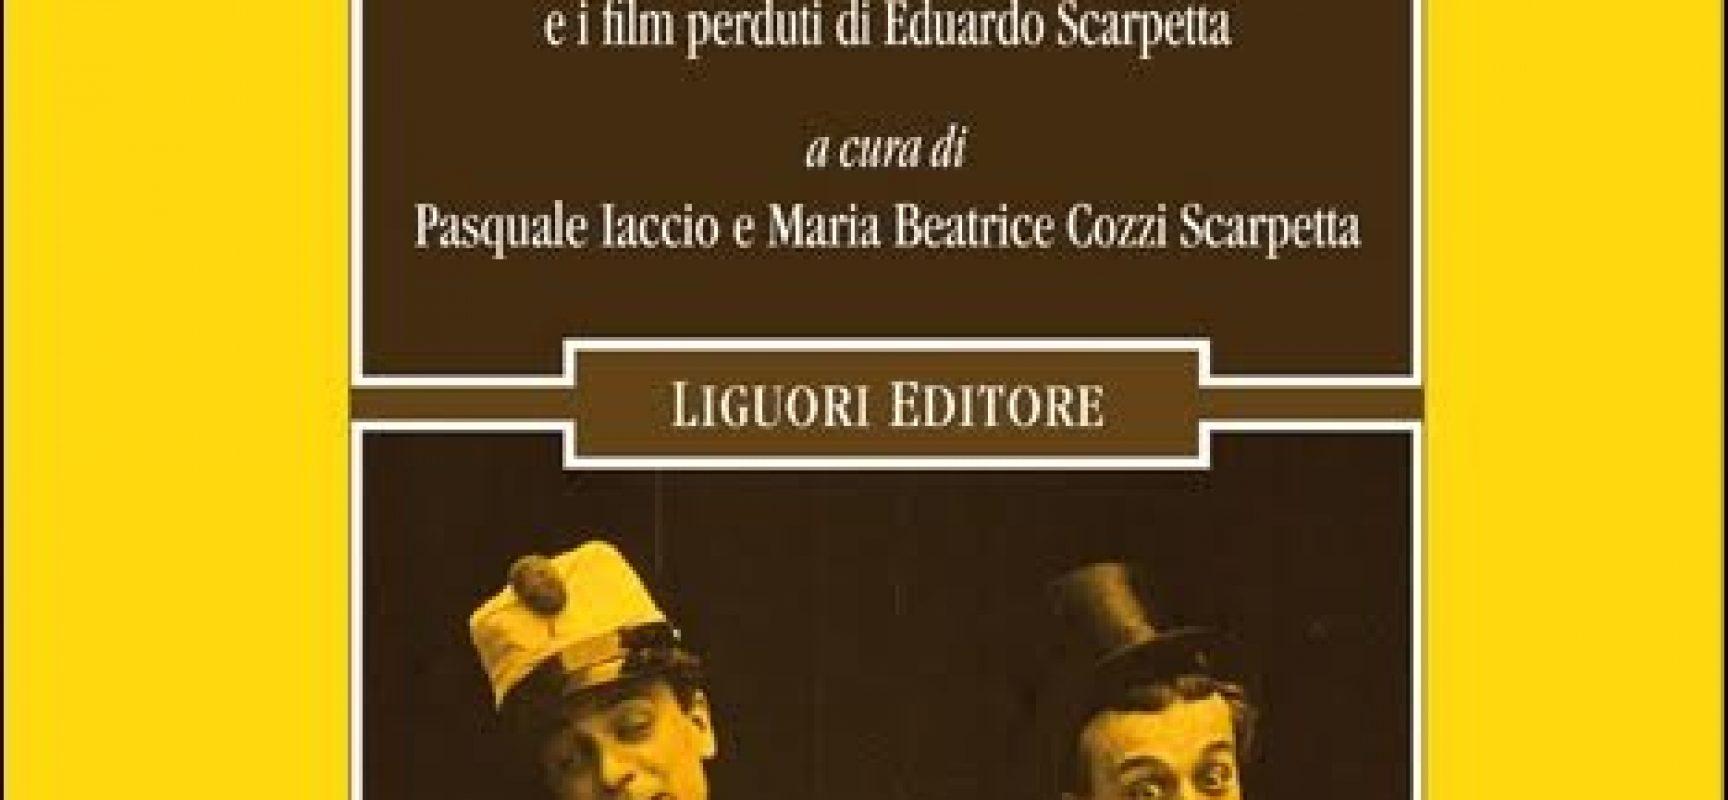 Cinema, i film di Scarpetta